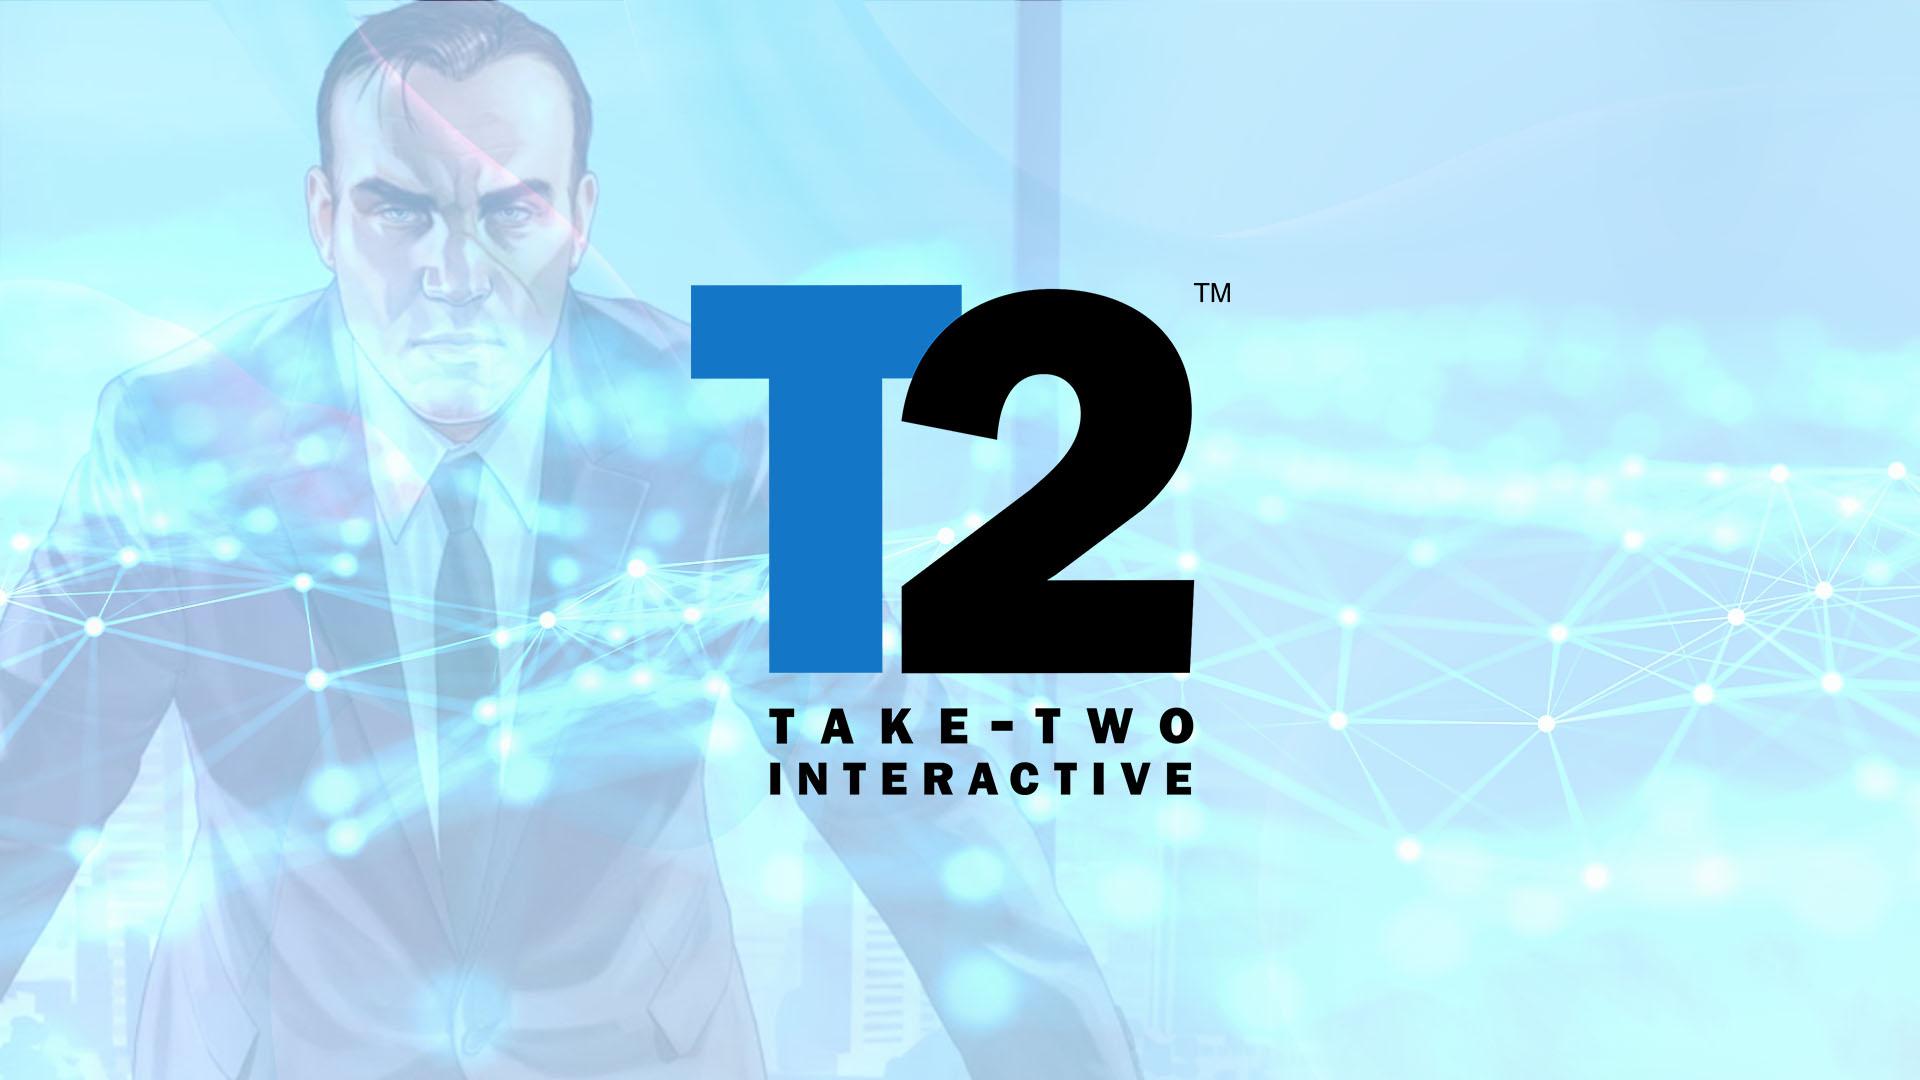 Spiele, Videospiele, Computerspiele, Take Two, Publisher, Verleger, Game Publisher, Spiele Publisher, T2, Take-Two, Take 2, Take-Two Interactive